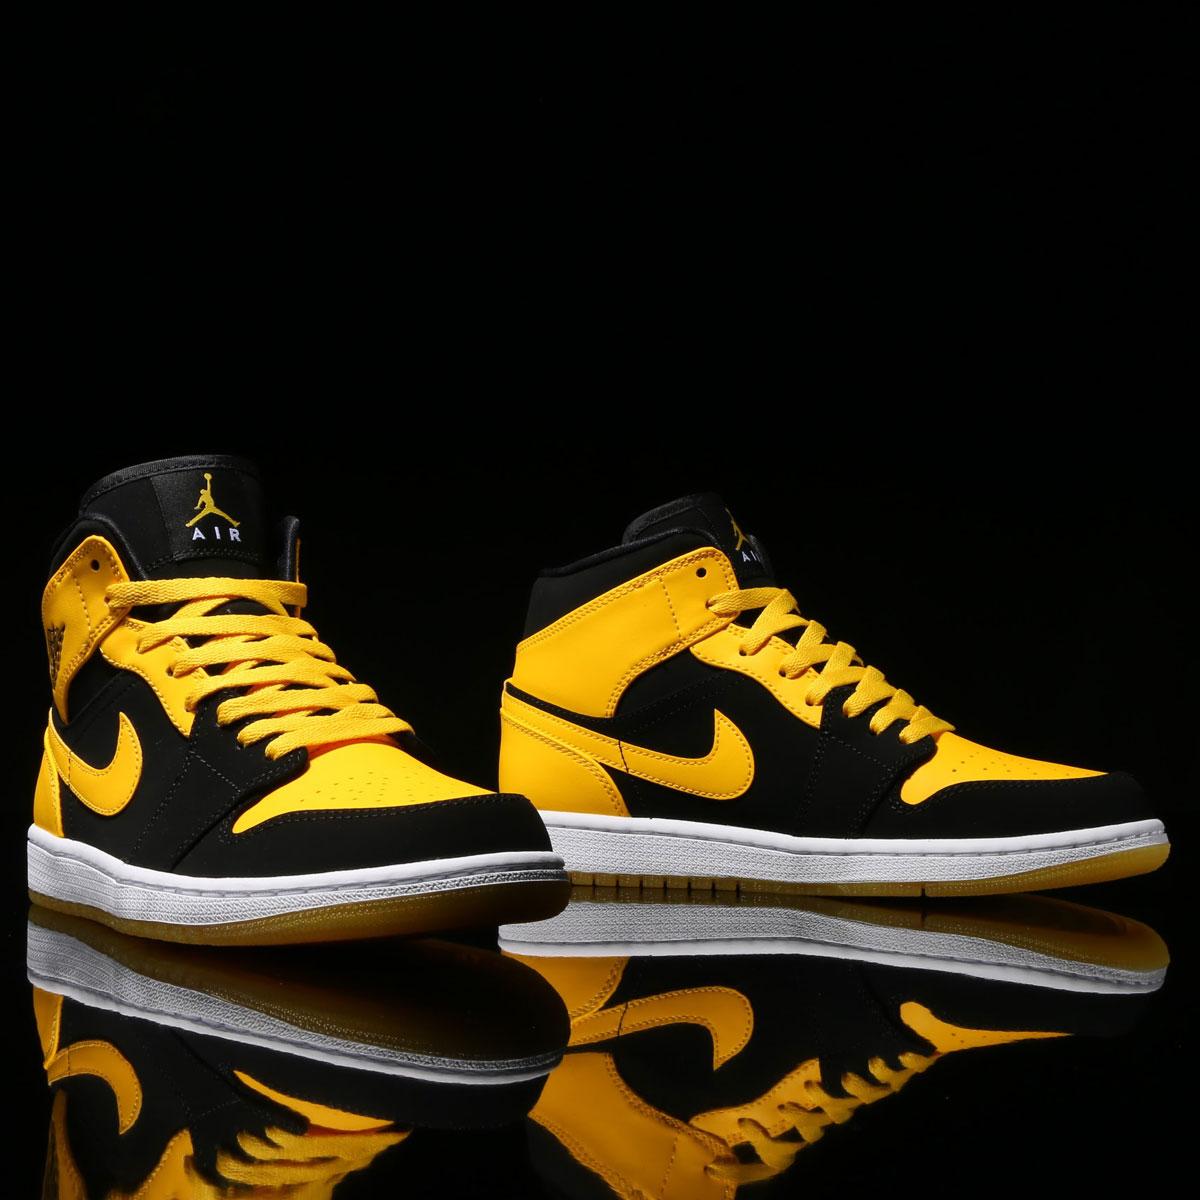 969f9d1876dd NIKE AIR JORDAN 1 MID (Nike Air Jordan 1 mid) BLACK VARSITY MAIZE-WHITE  17SU-S